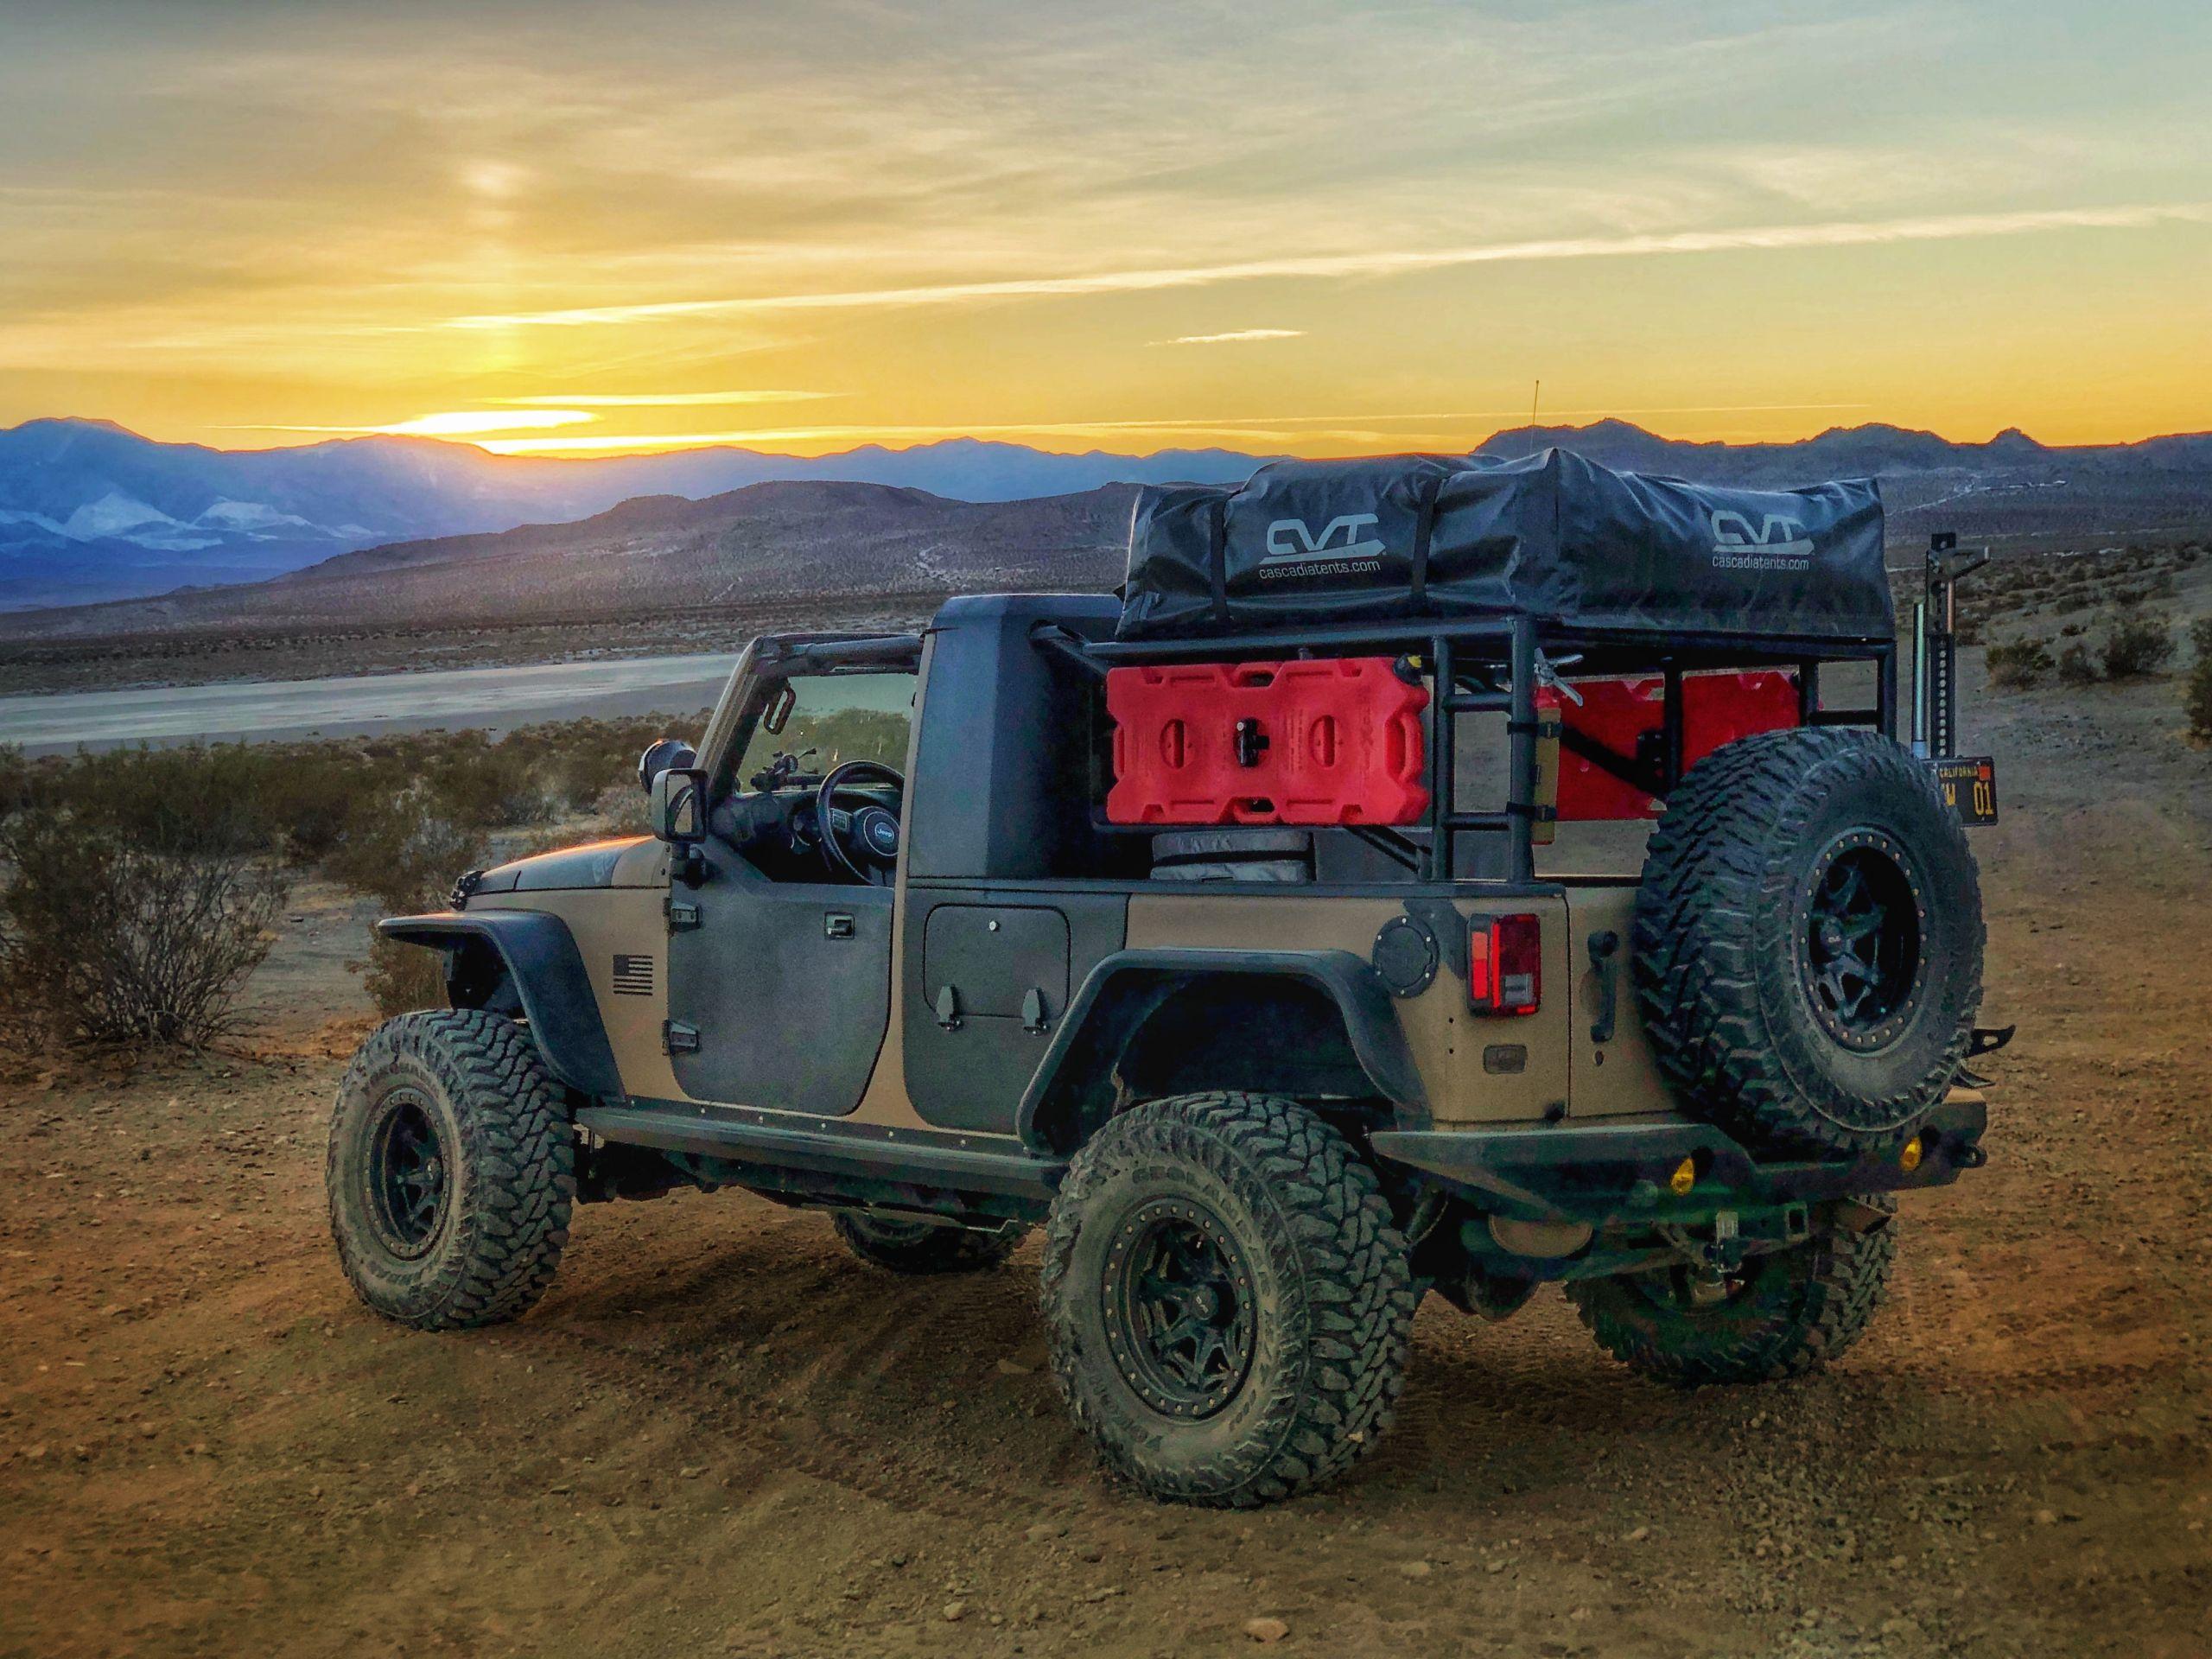 Custom Off Road, Overlanding & Camping Jeep JK Build - Image #06